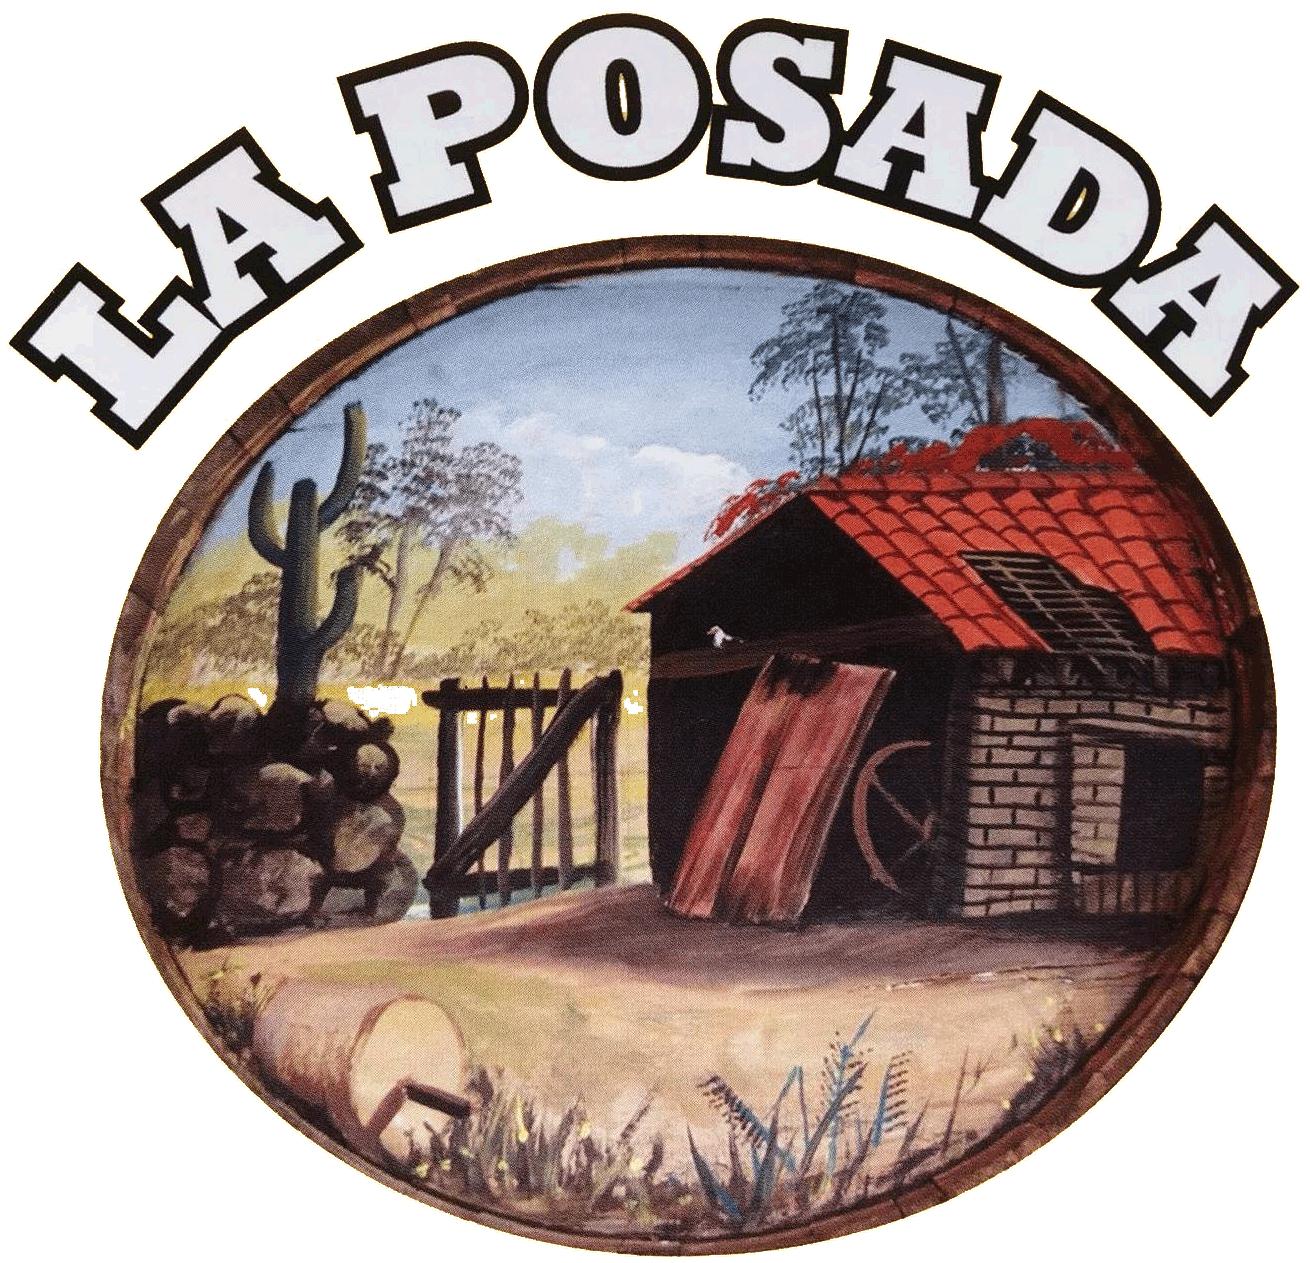 laposada-logo